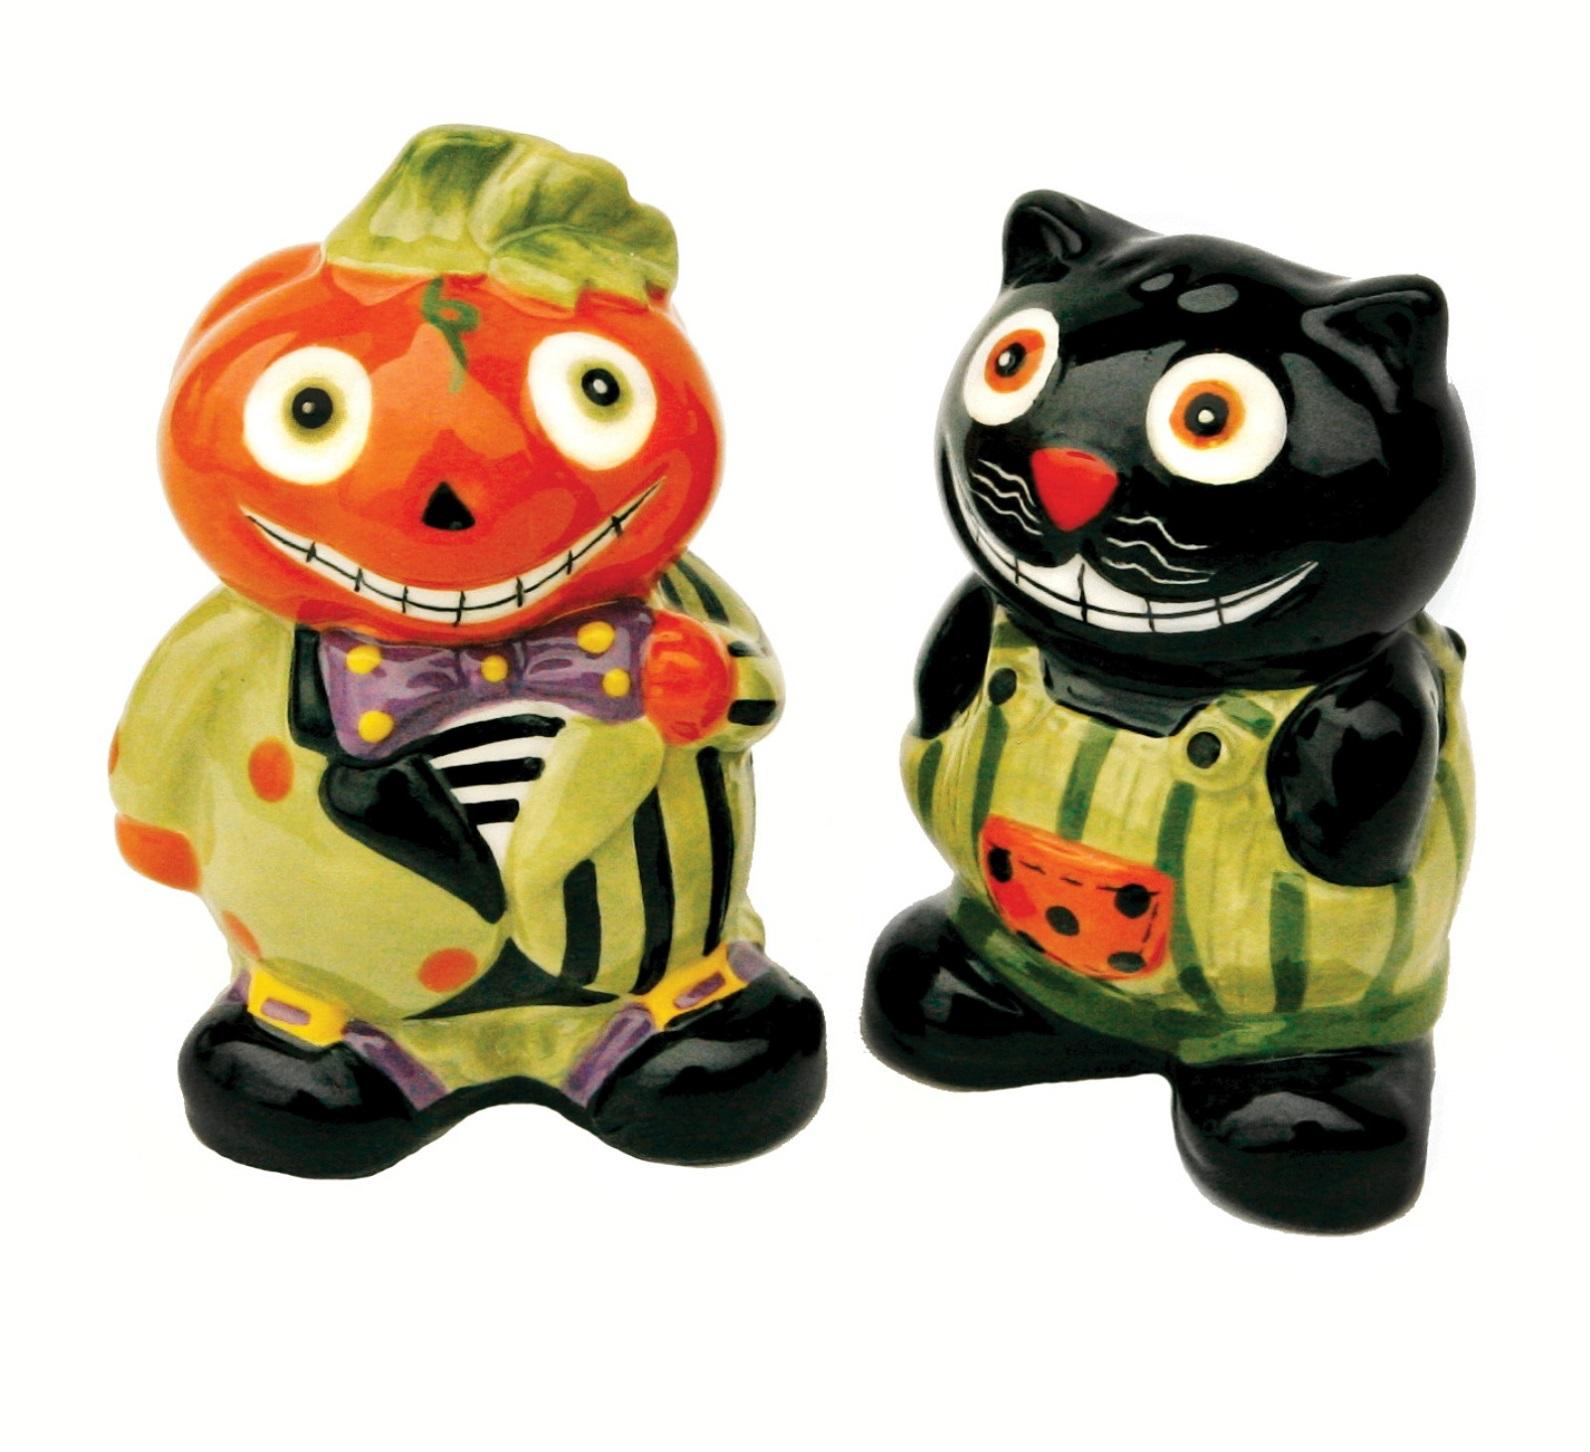 Ceiling Fan Pulls Decorative Halloween Pumpkin Jack and Black Cat Ceramic Salt and ...